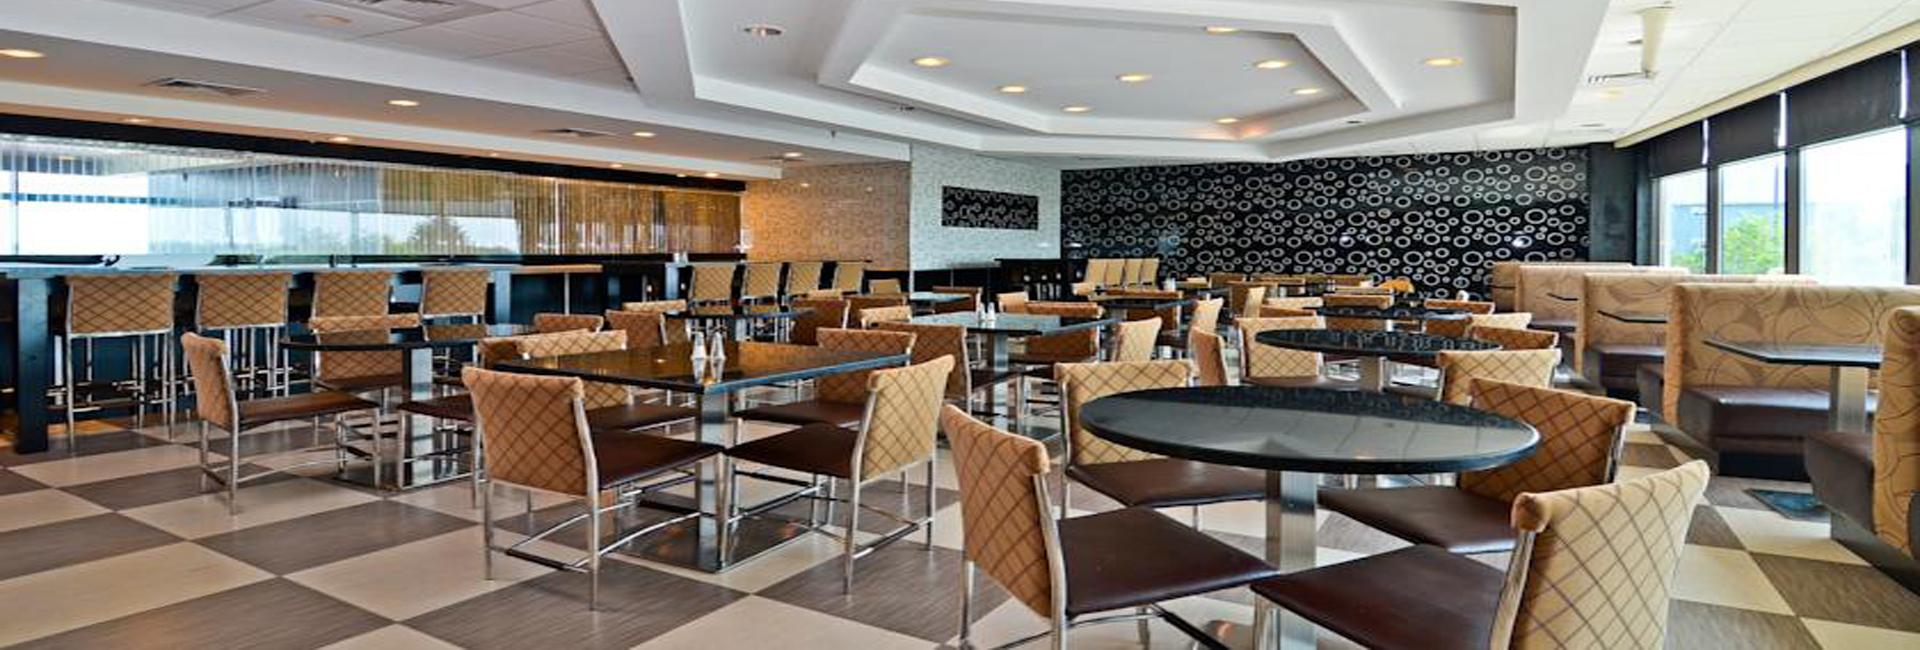 Breakfast Restaurants Near Atlantic City Nj